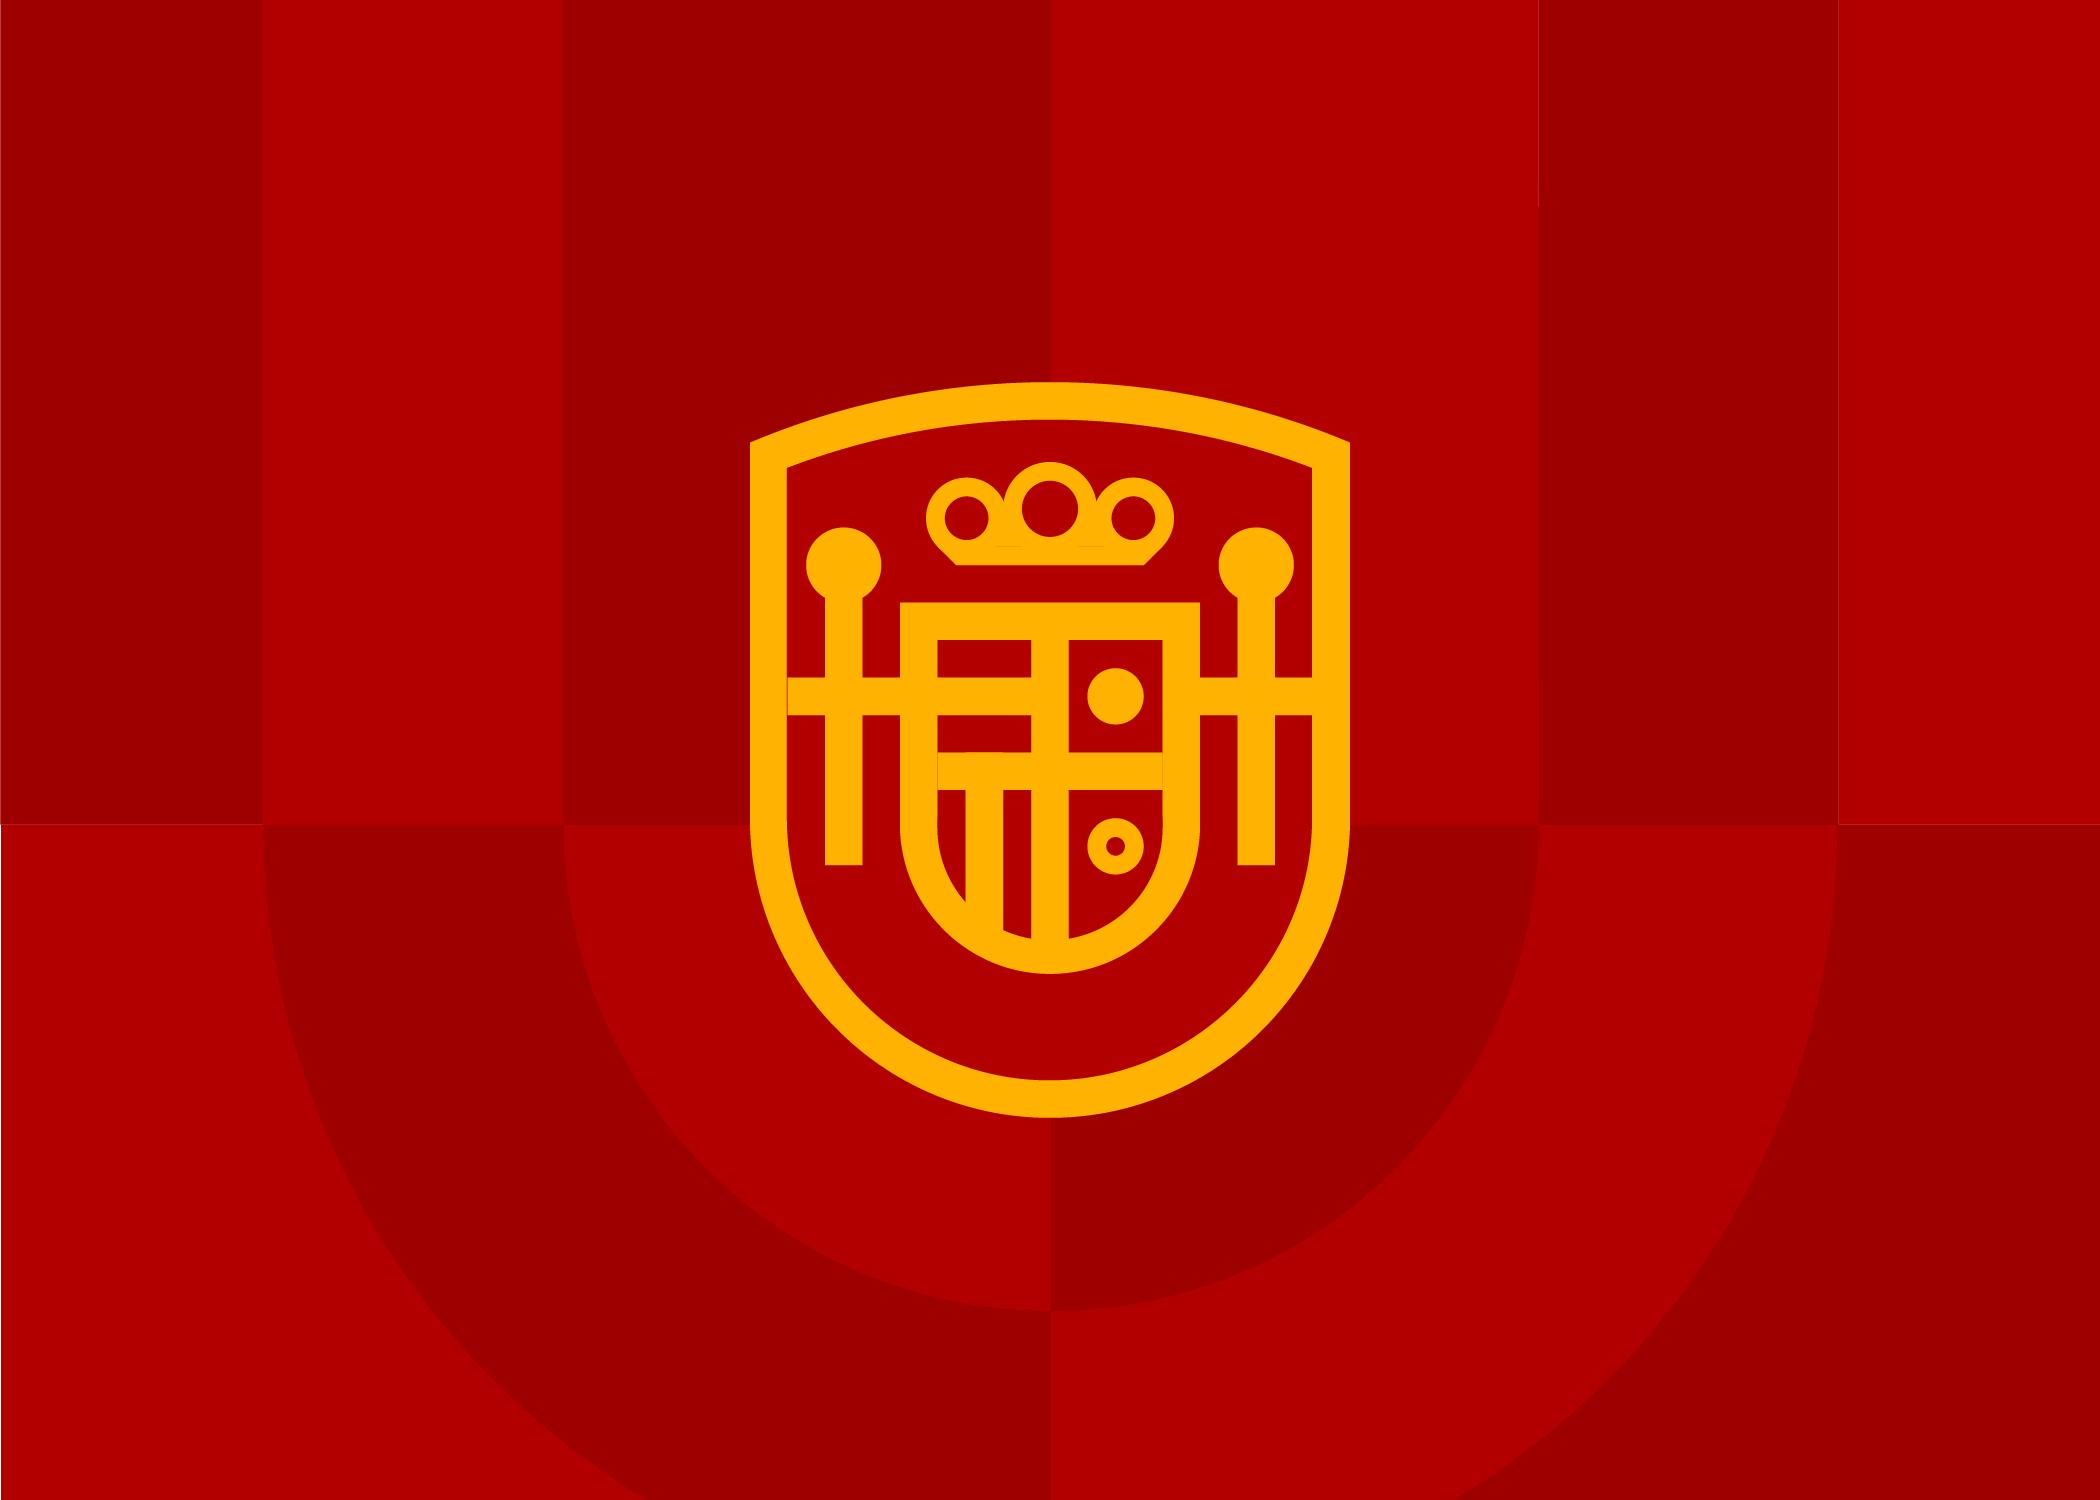 Spain-Geometric-World-Cup-Football-Badge-01-Logo-Design-Freelance-Kent.png